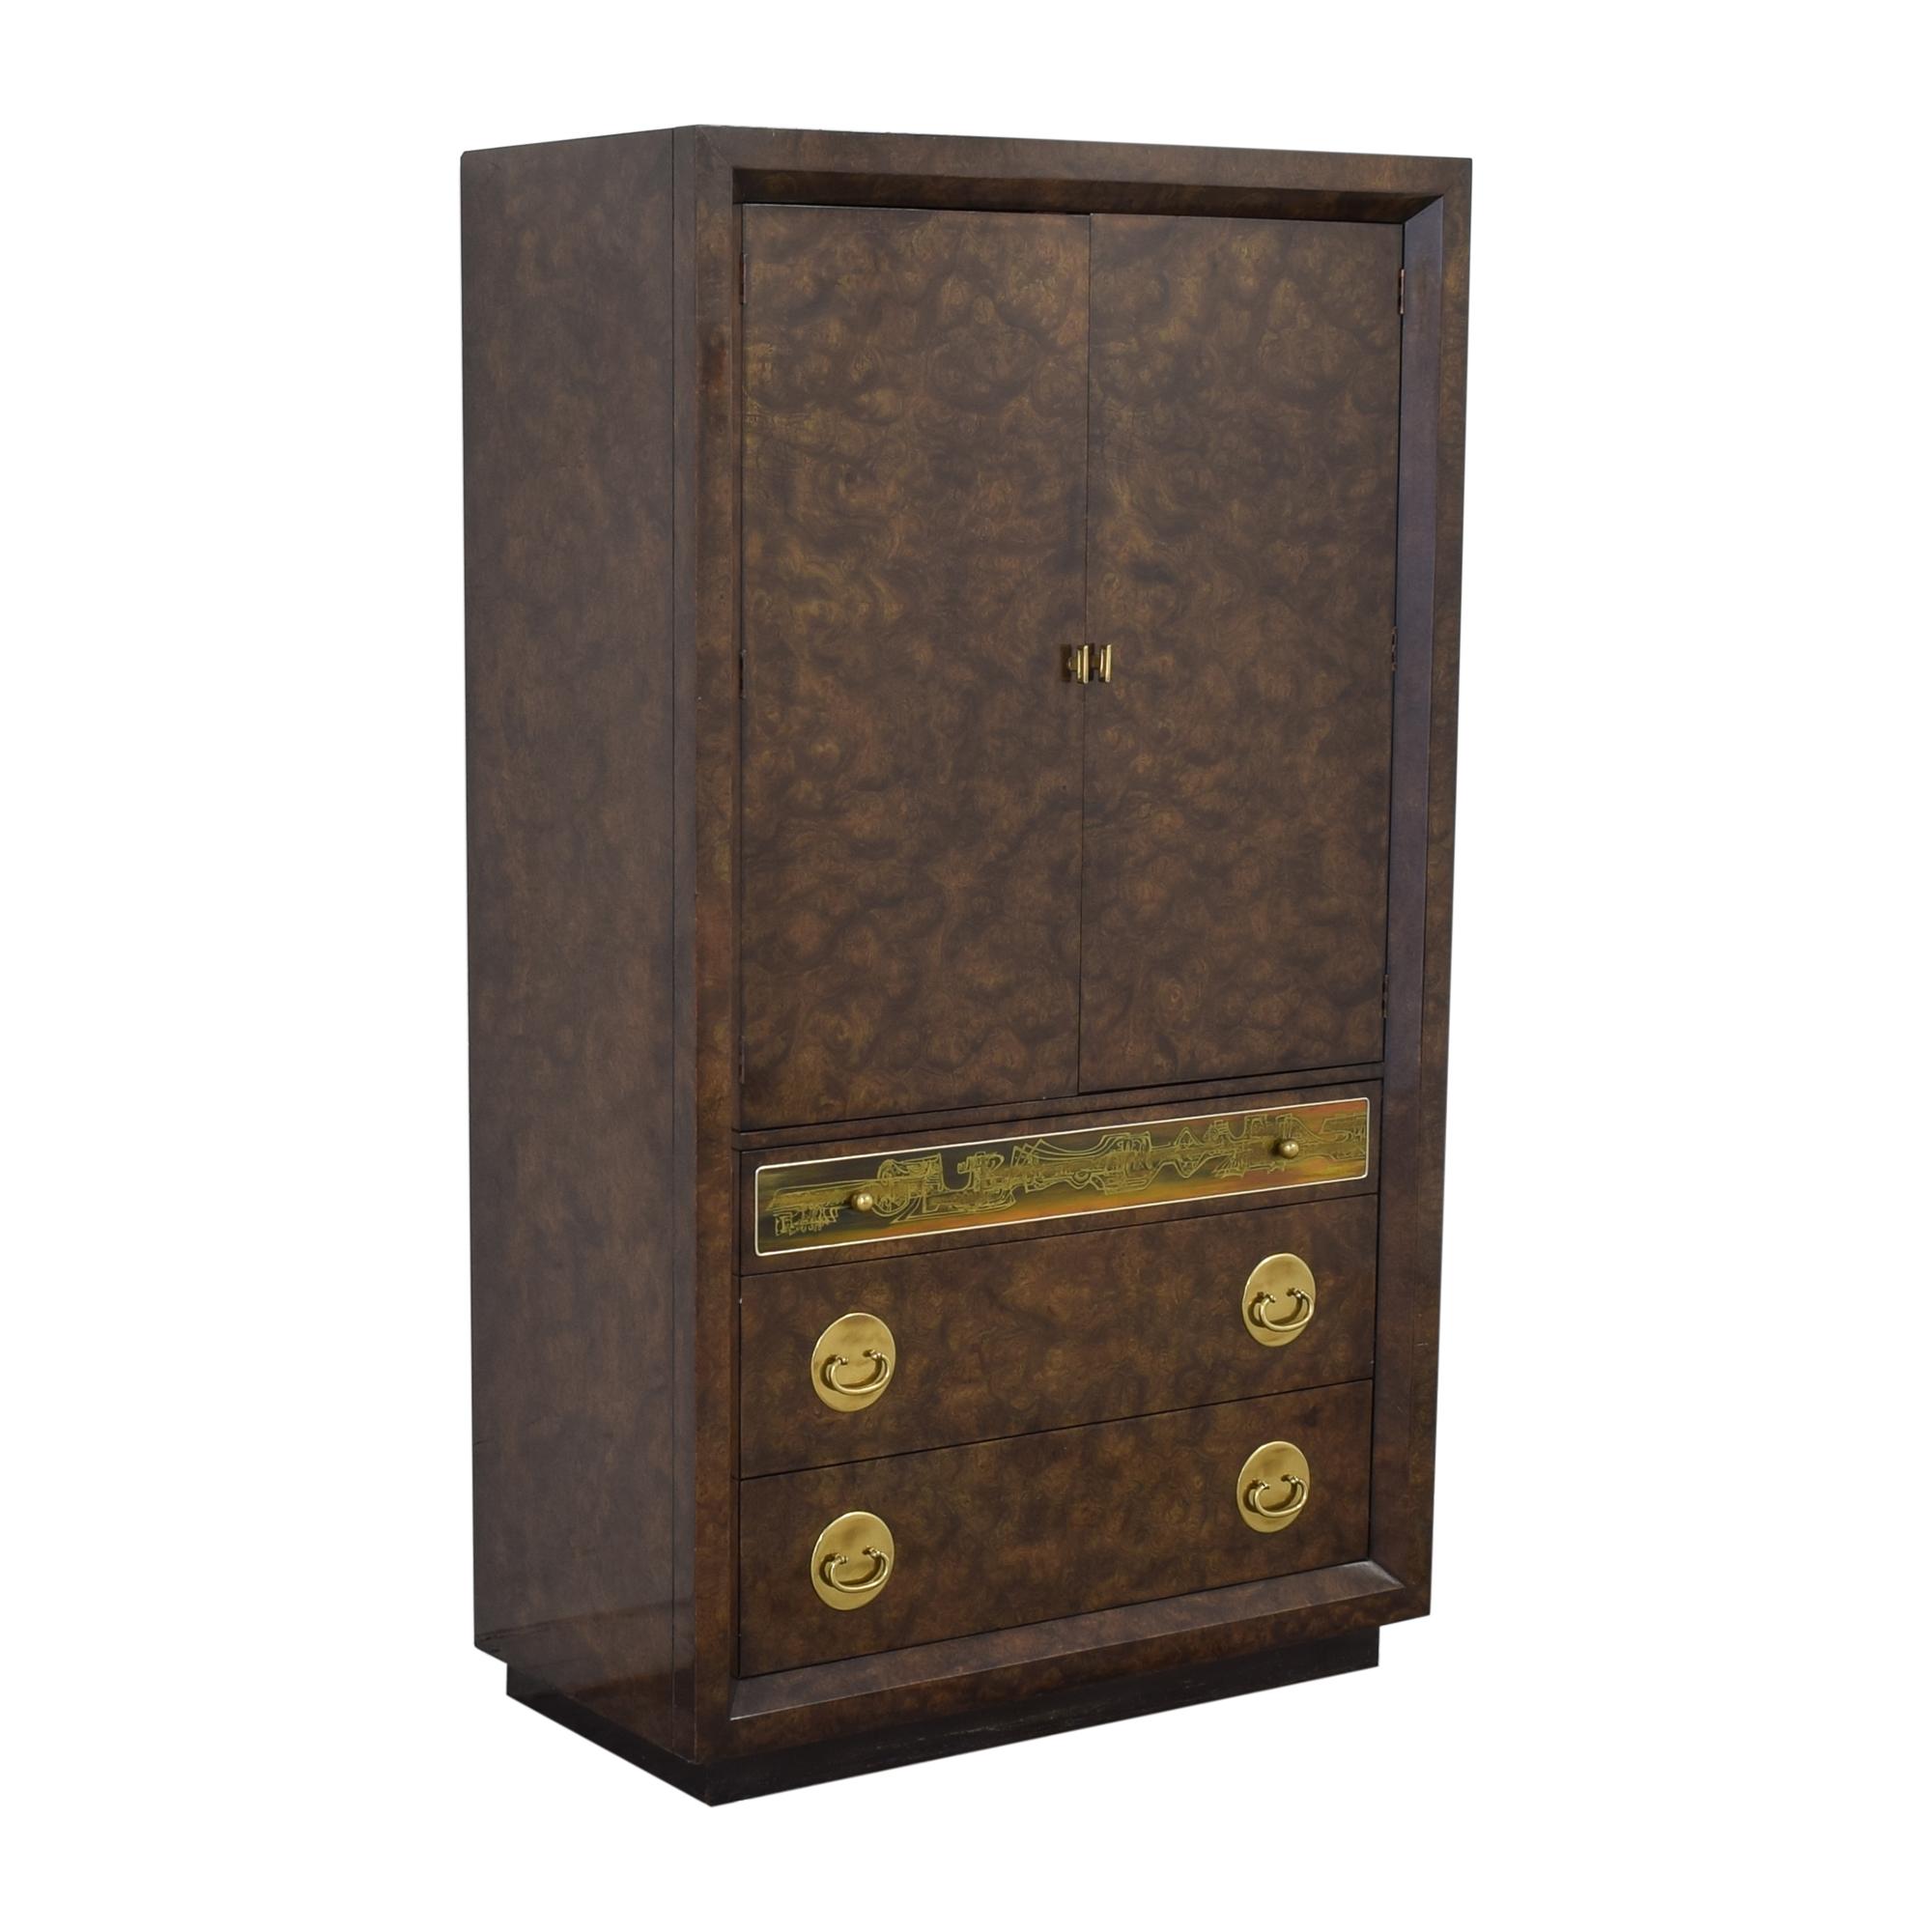 Mastercraft Furniture Mastercraft Burlwood Armoir Dresser Vintage pa